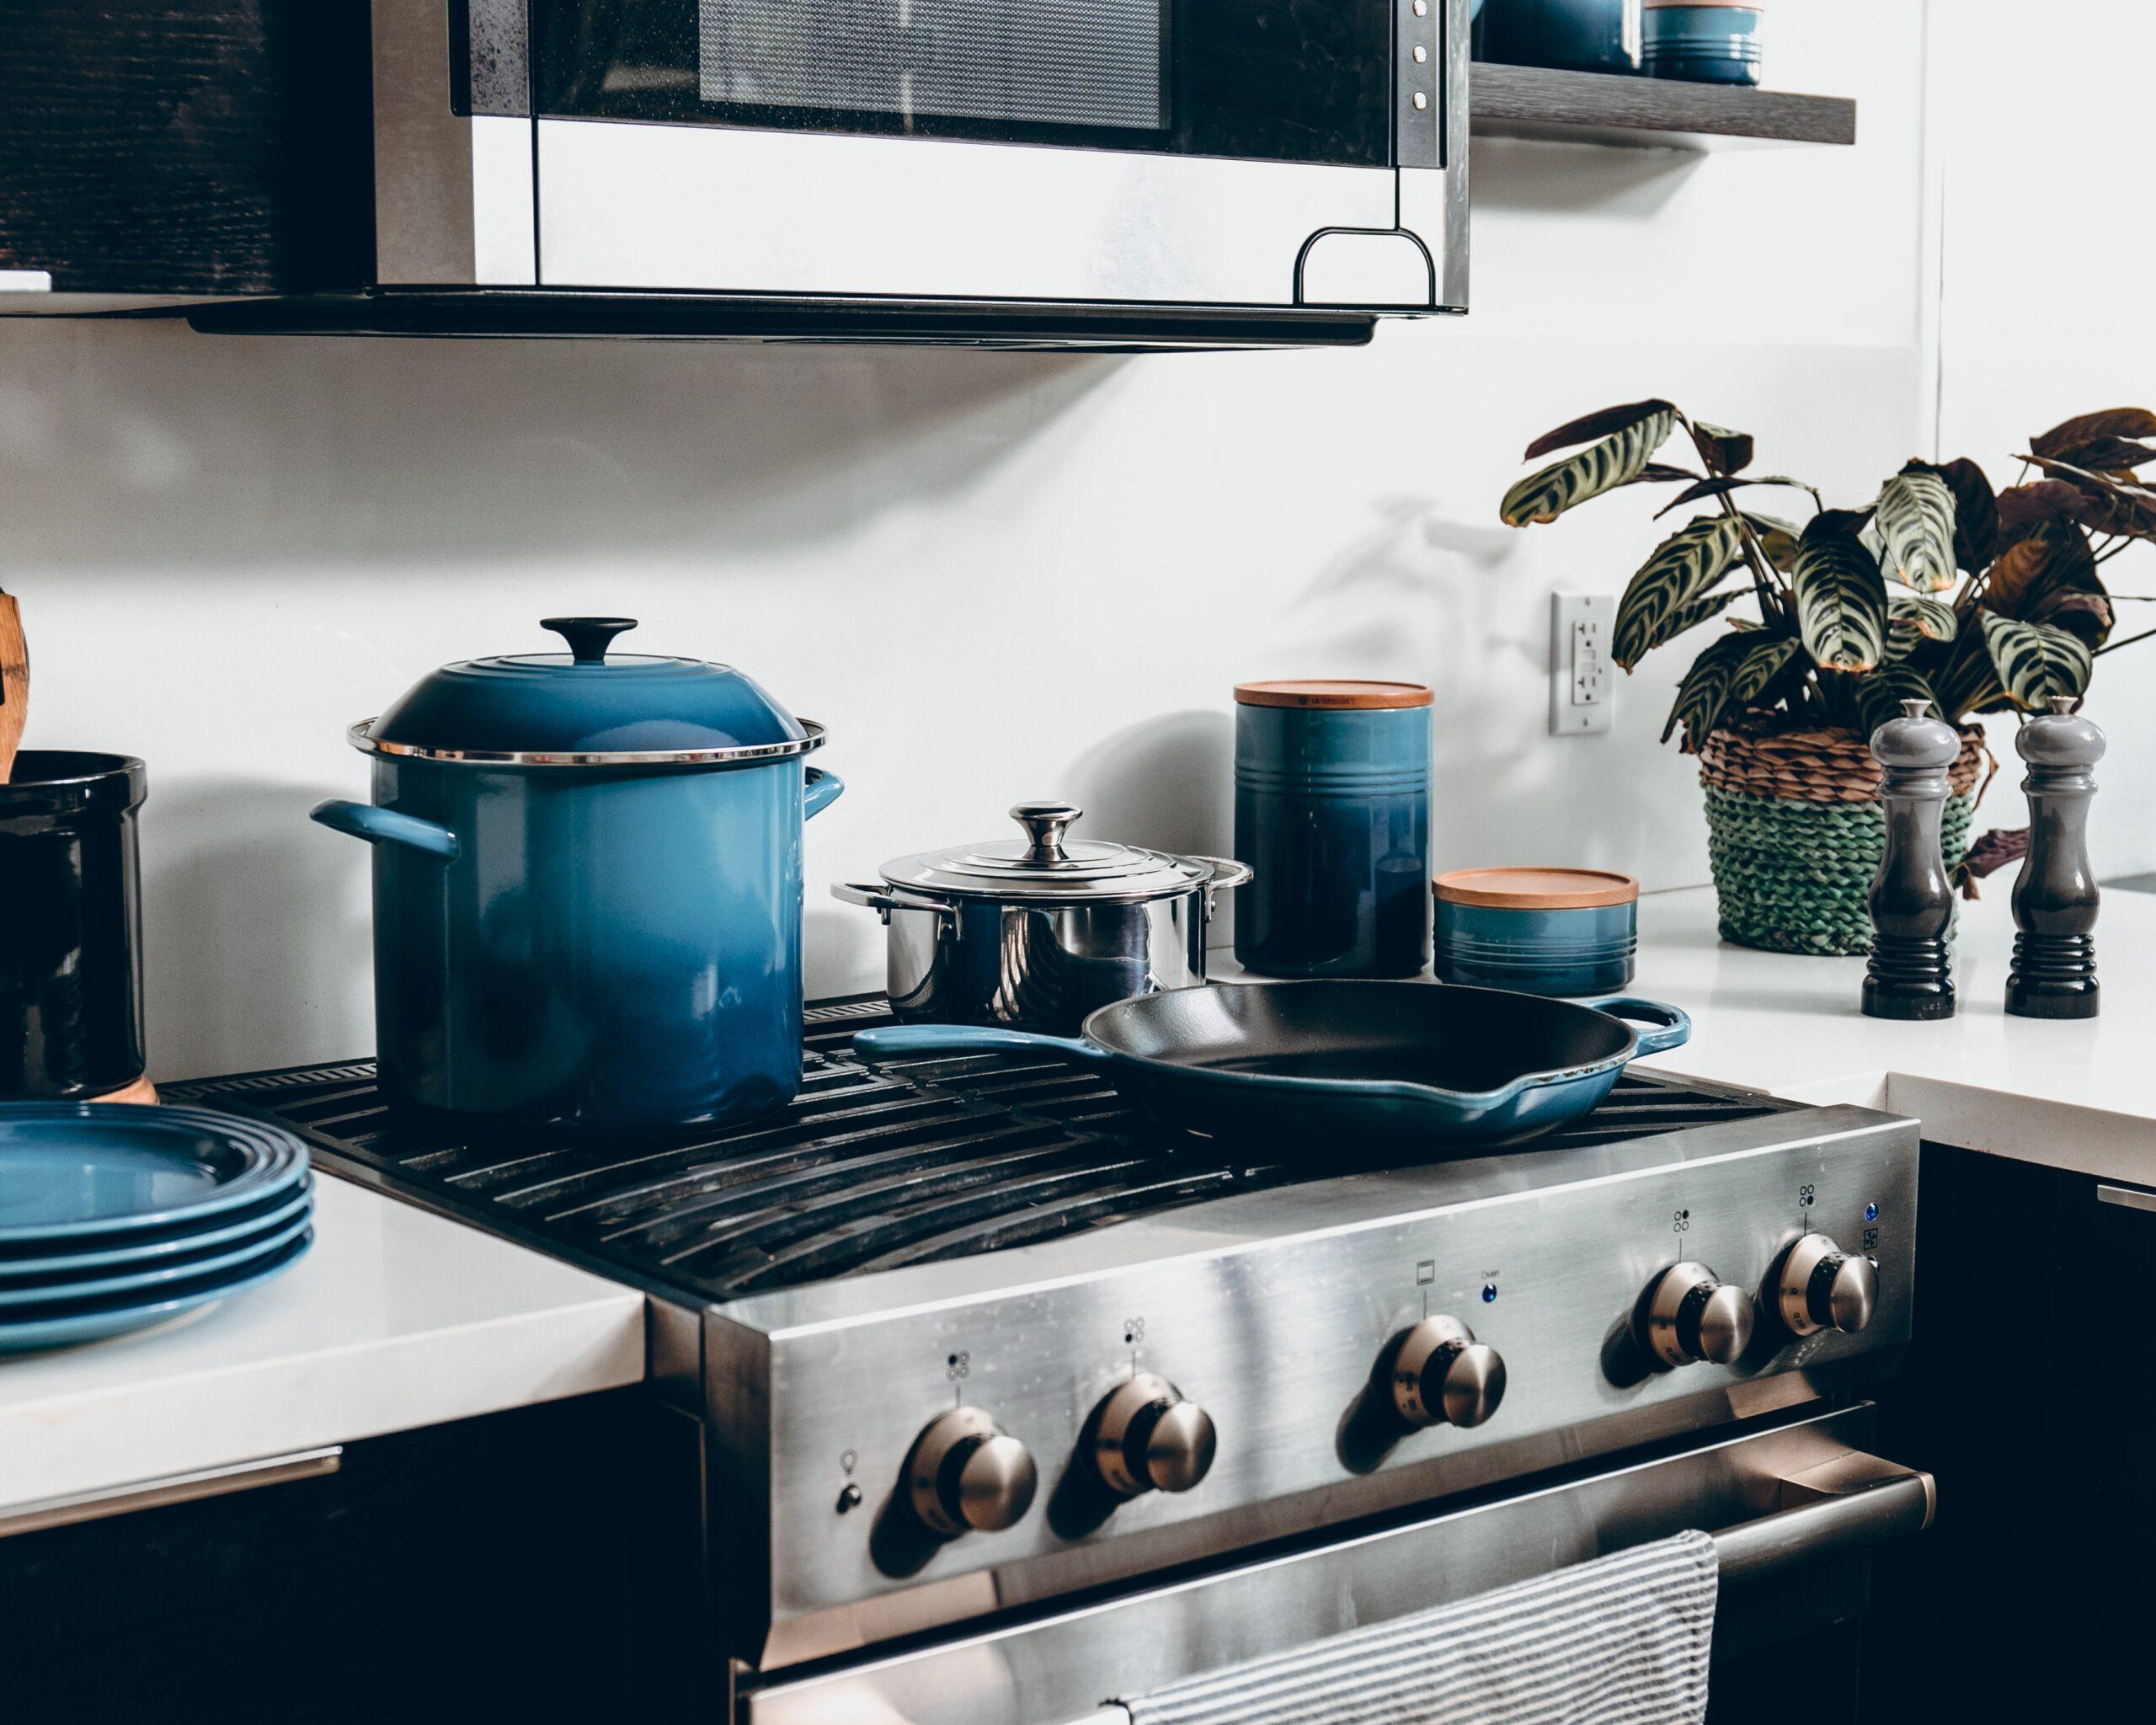 gas cooker appliance